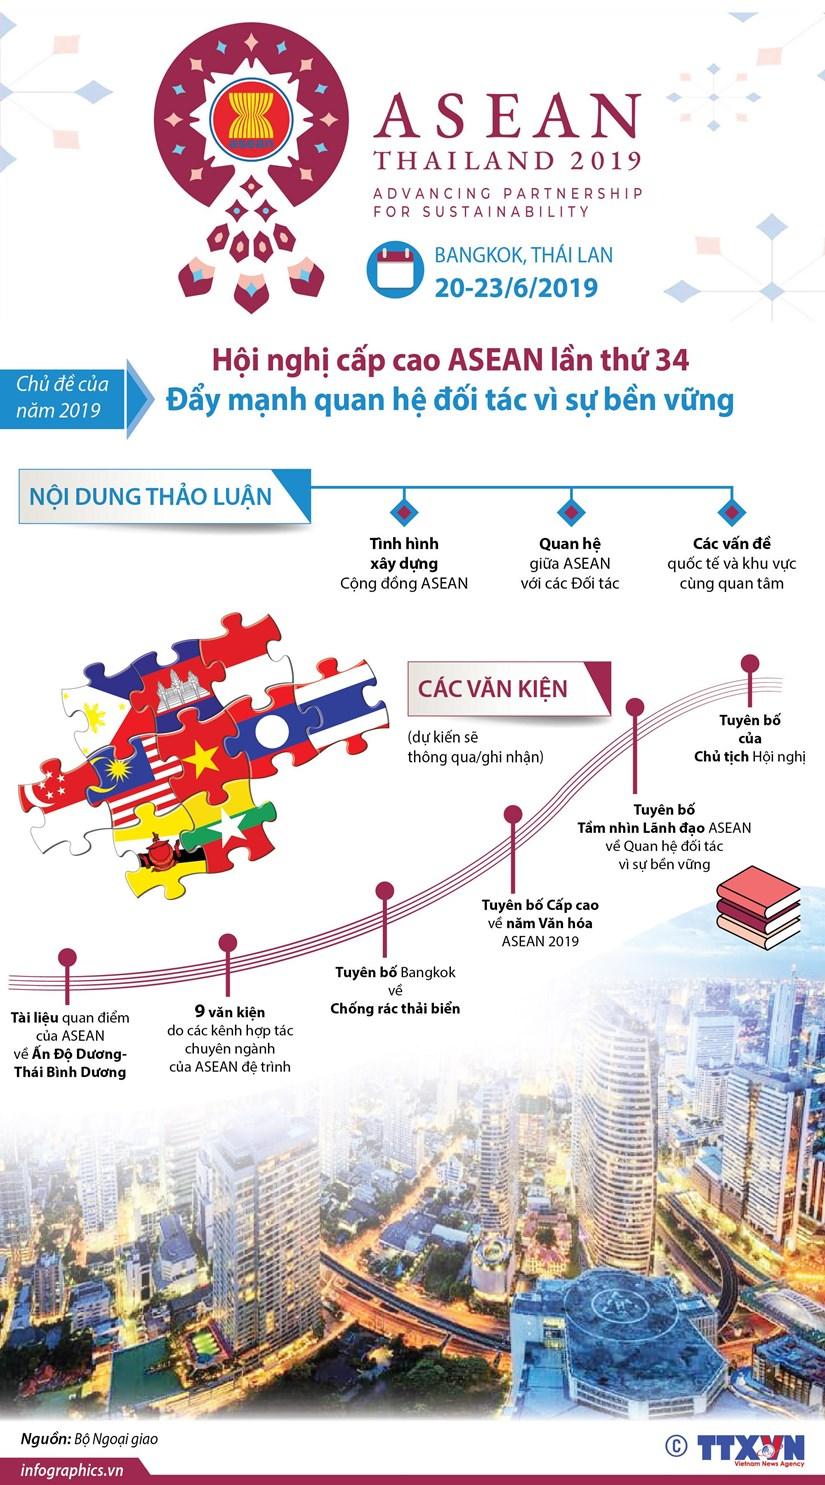 Hoi nghi cap cao ASEAN: Day manh quan he doi tac vi su ben vung hinh anh 1